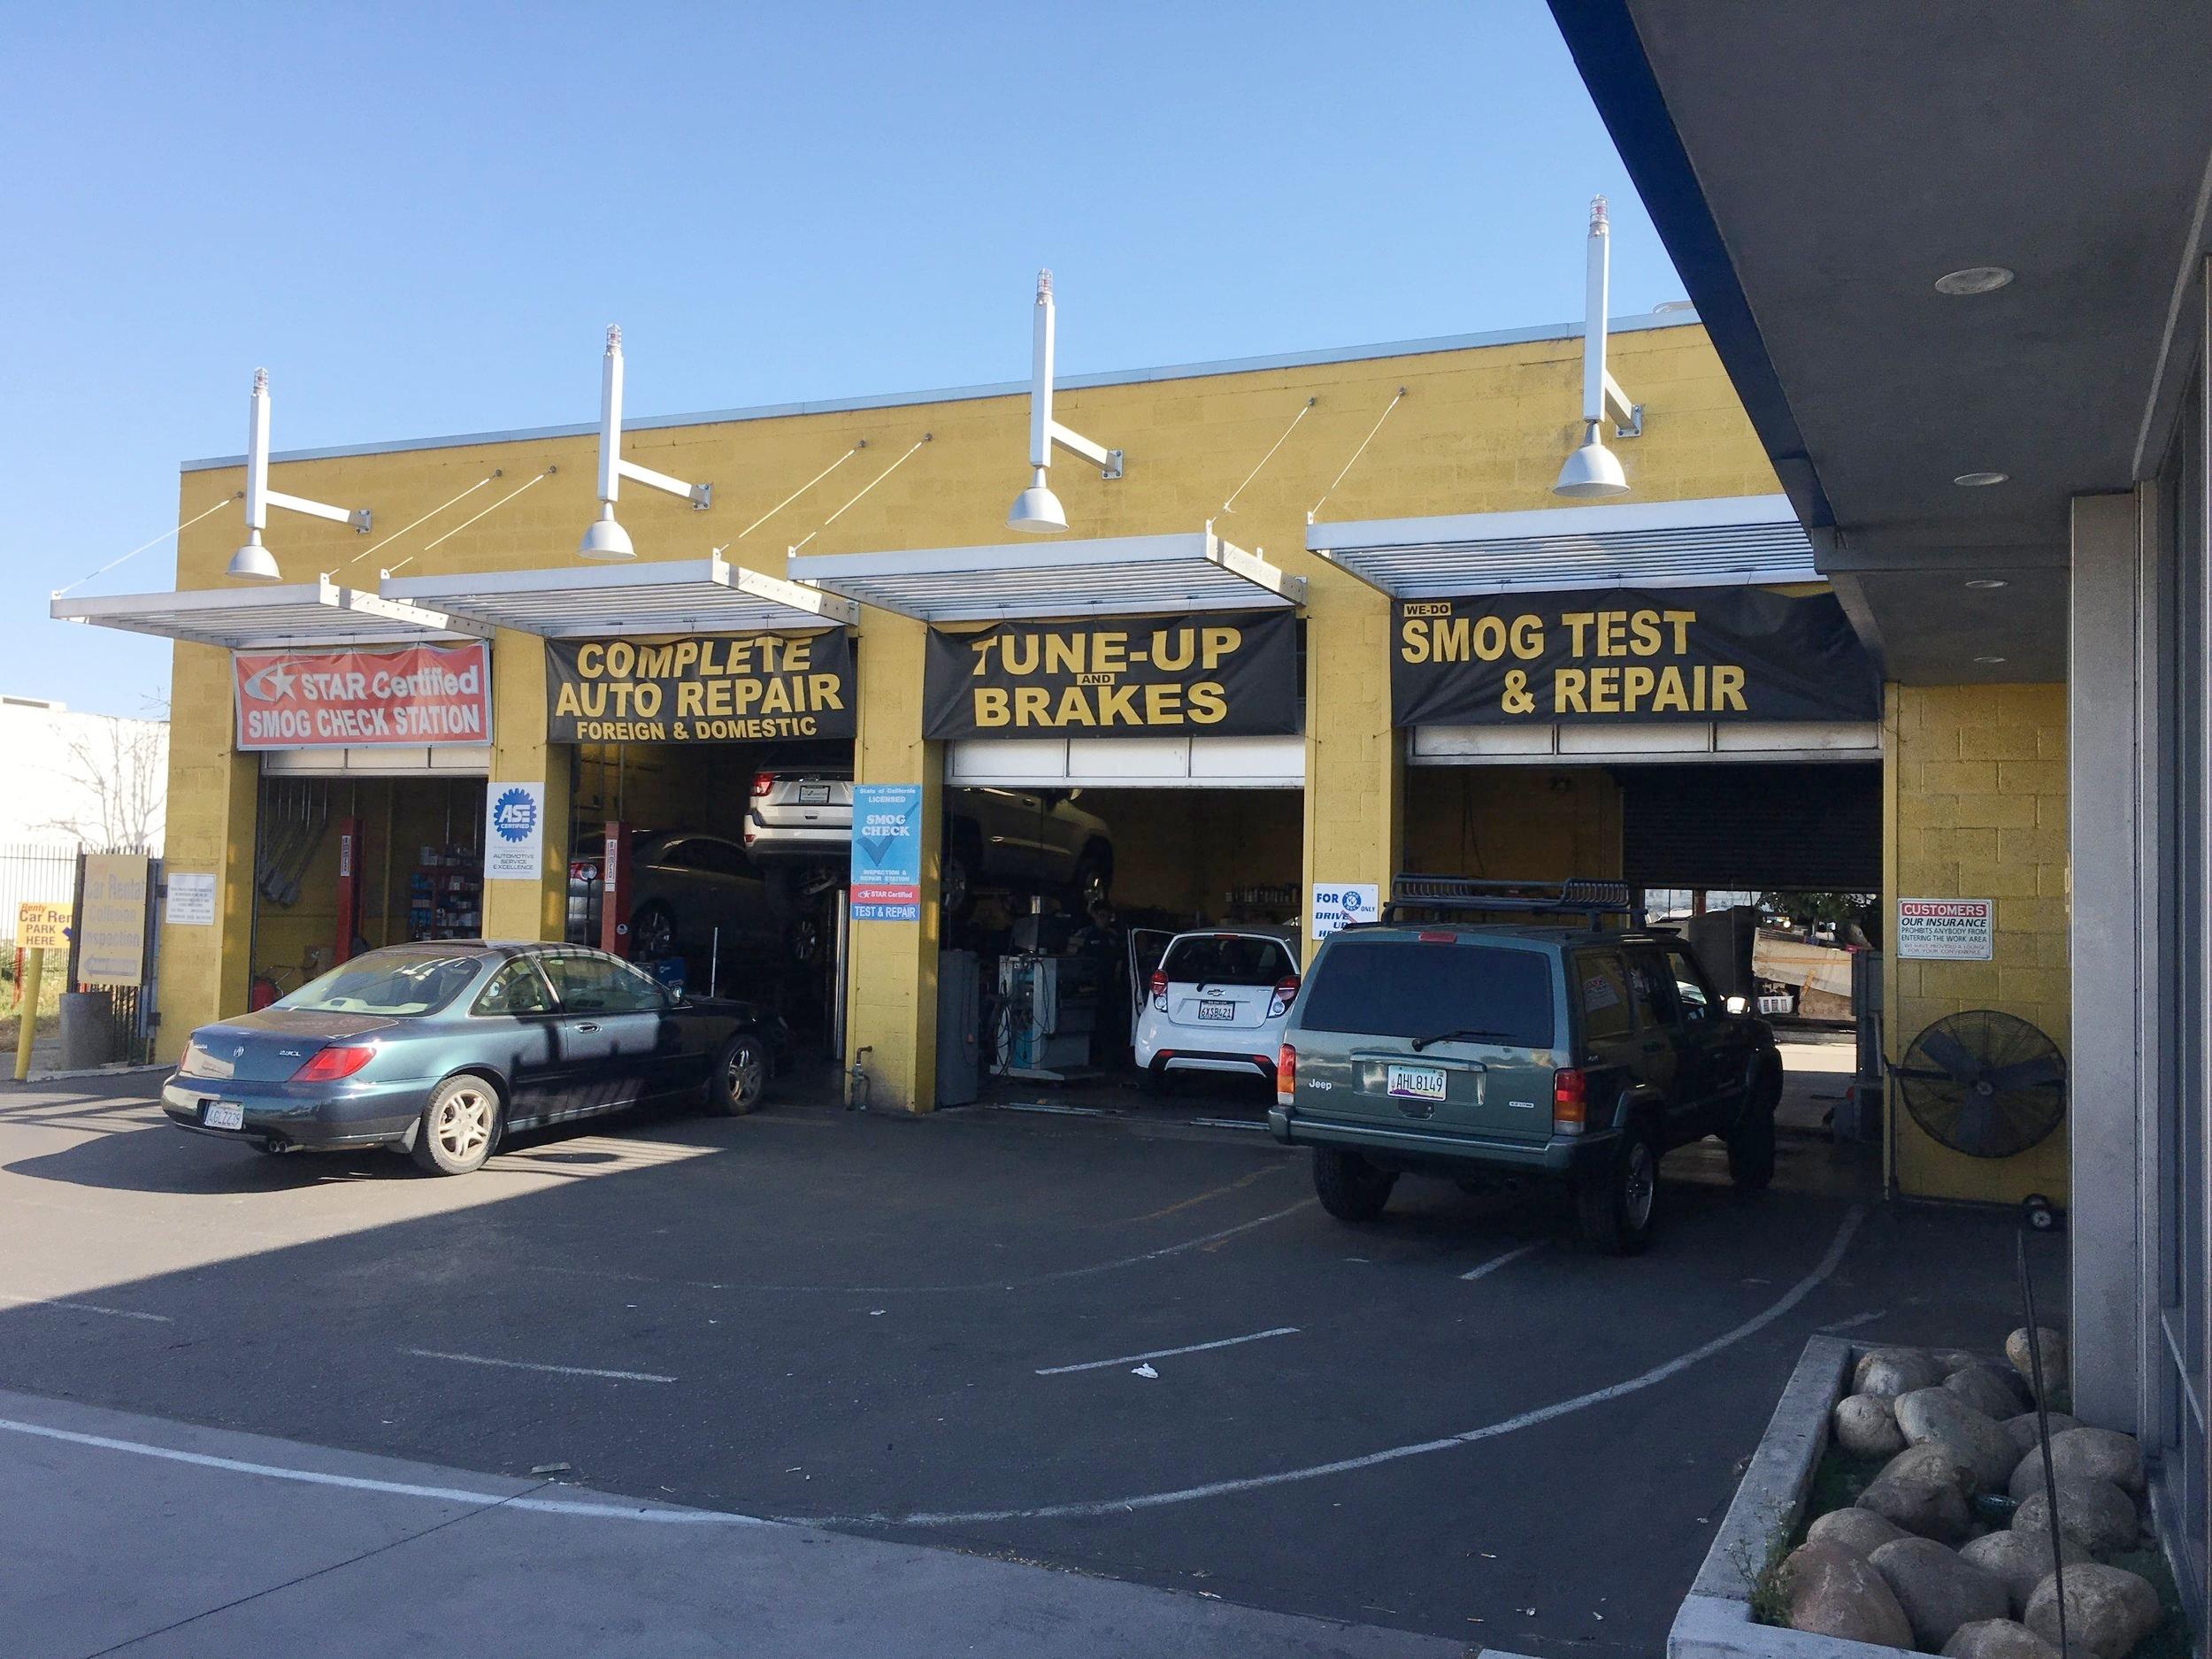 California Motor Works & Tires car repair shop in Kearny Mesa, San Diego